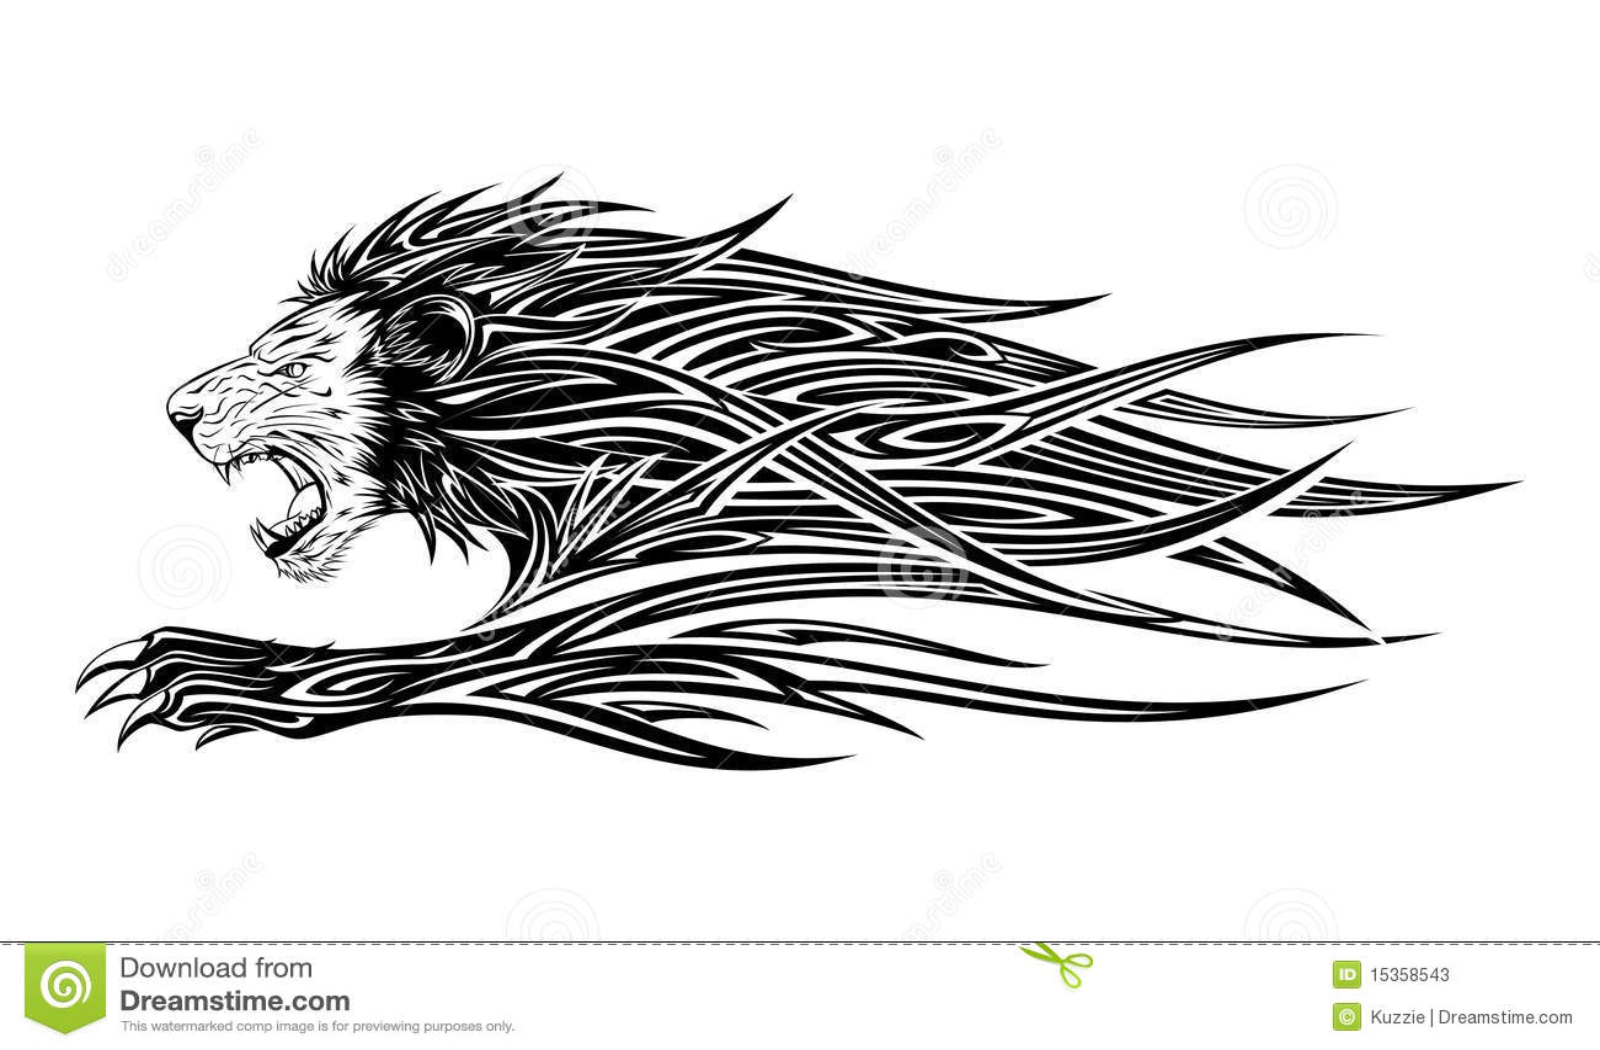 Lion Tattoo Stock Photos  Image 15358543